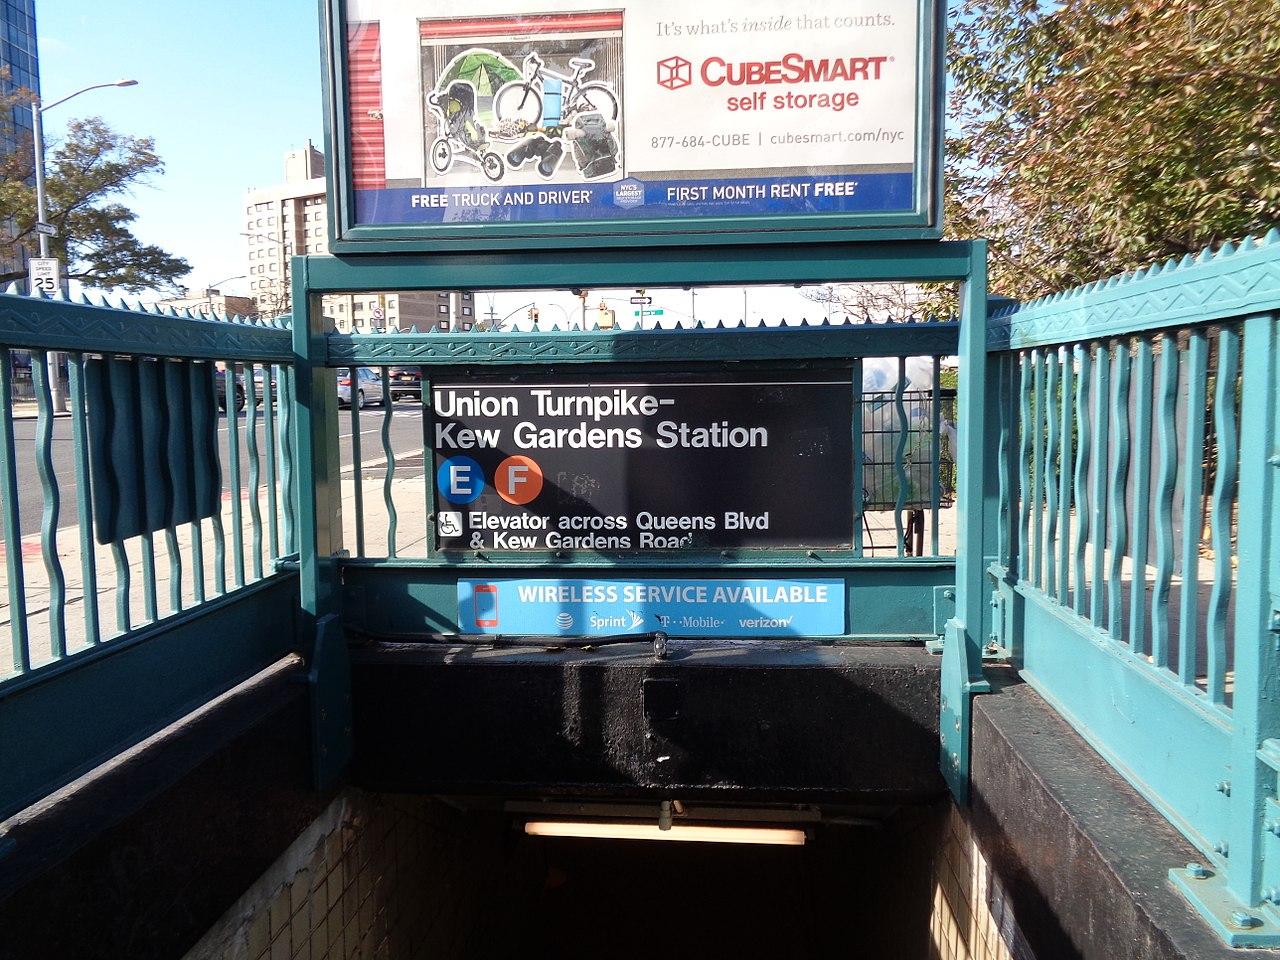 Kew Gardens Union Turnpike Subway Stop